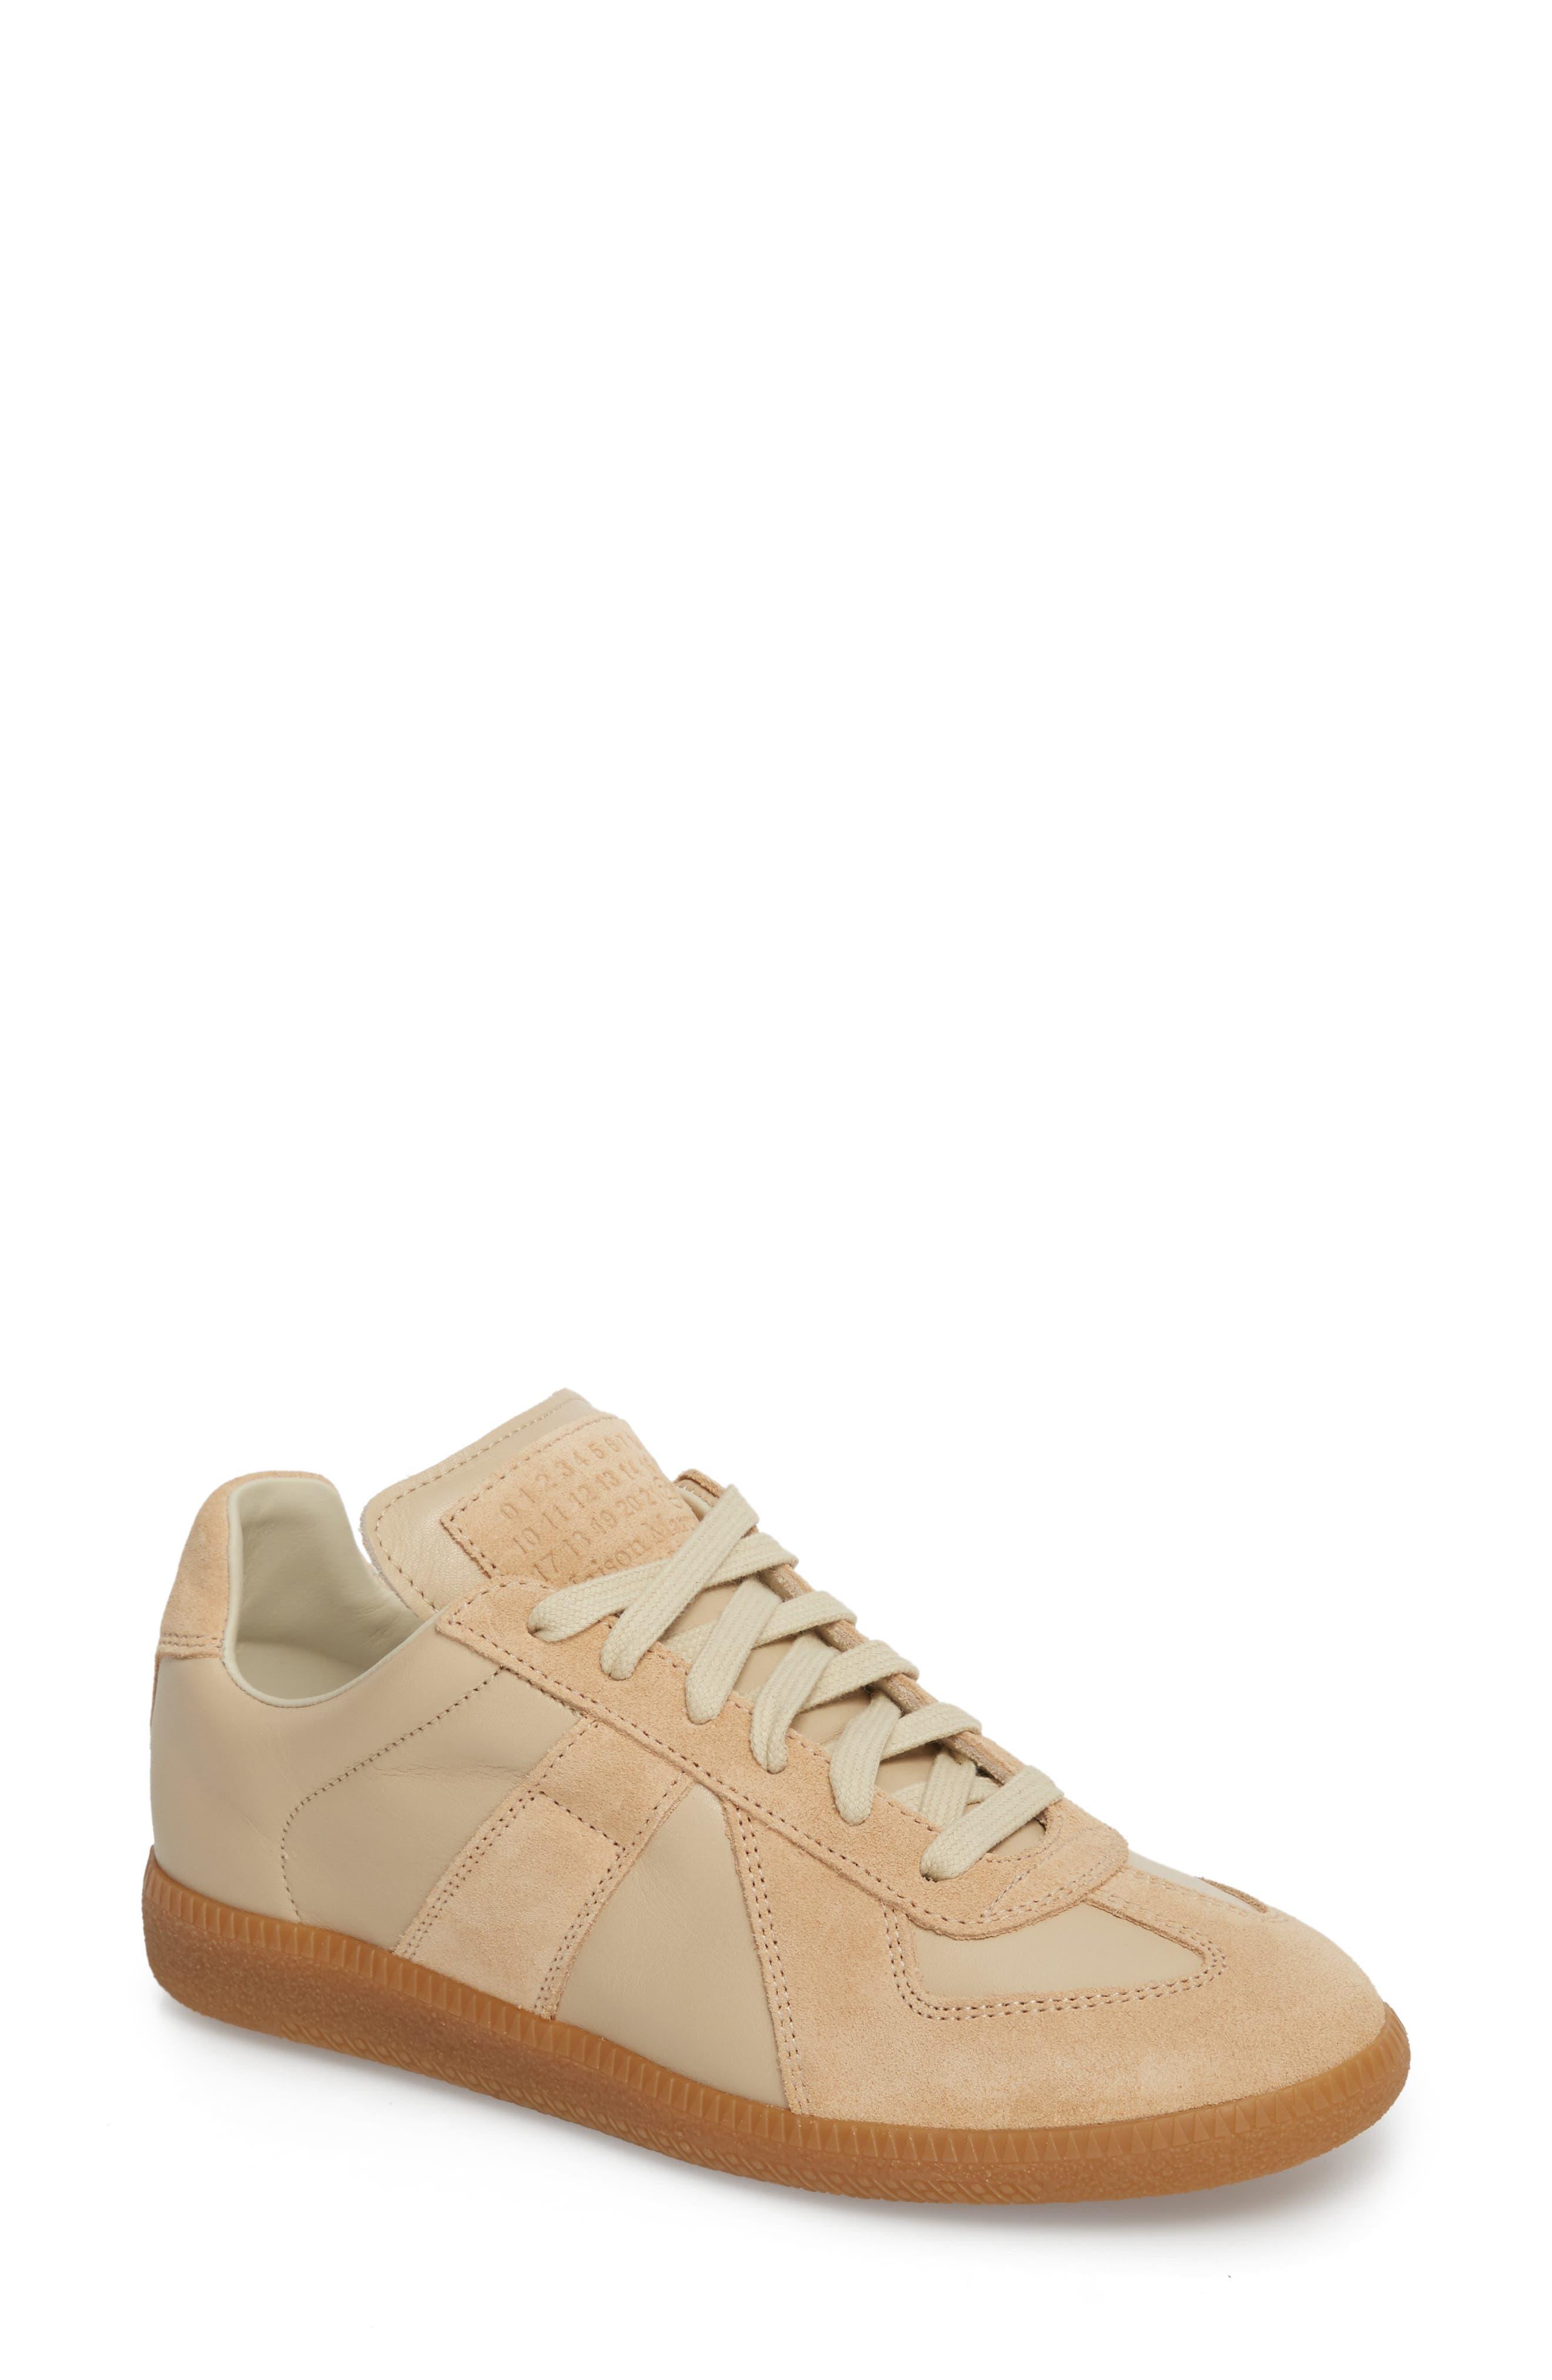 Maison Margiela Replica Sneaker (Women)